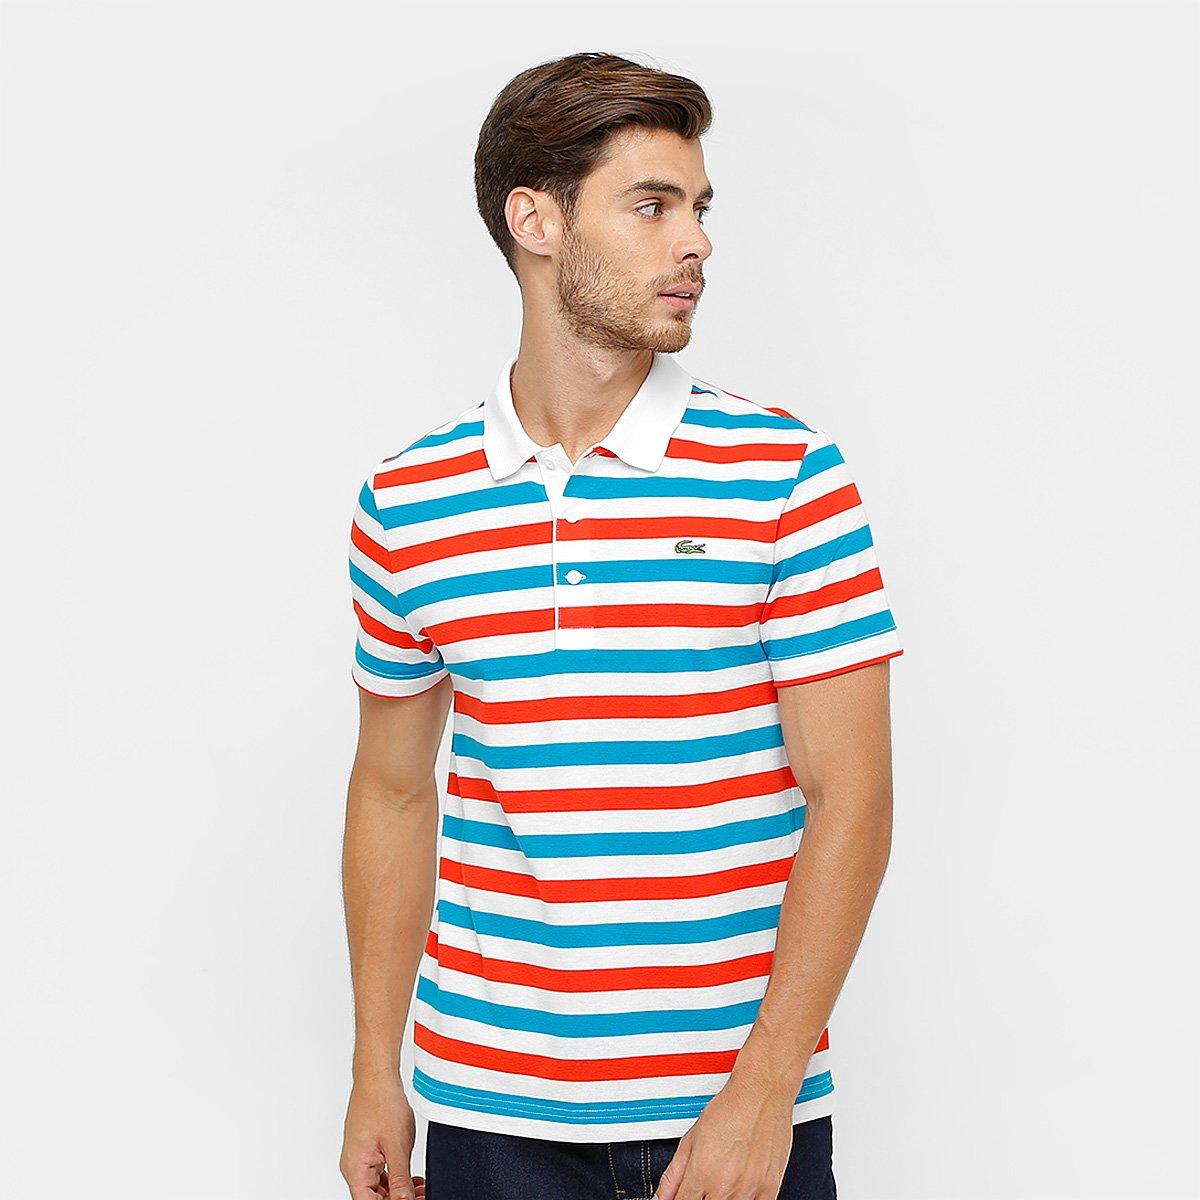 797b31da24f Camisa Polo Lacoste Listrada Masculina - Compre Agora